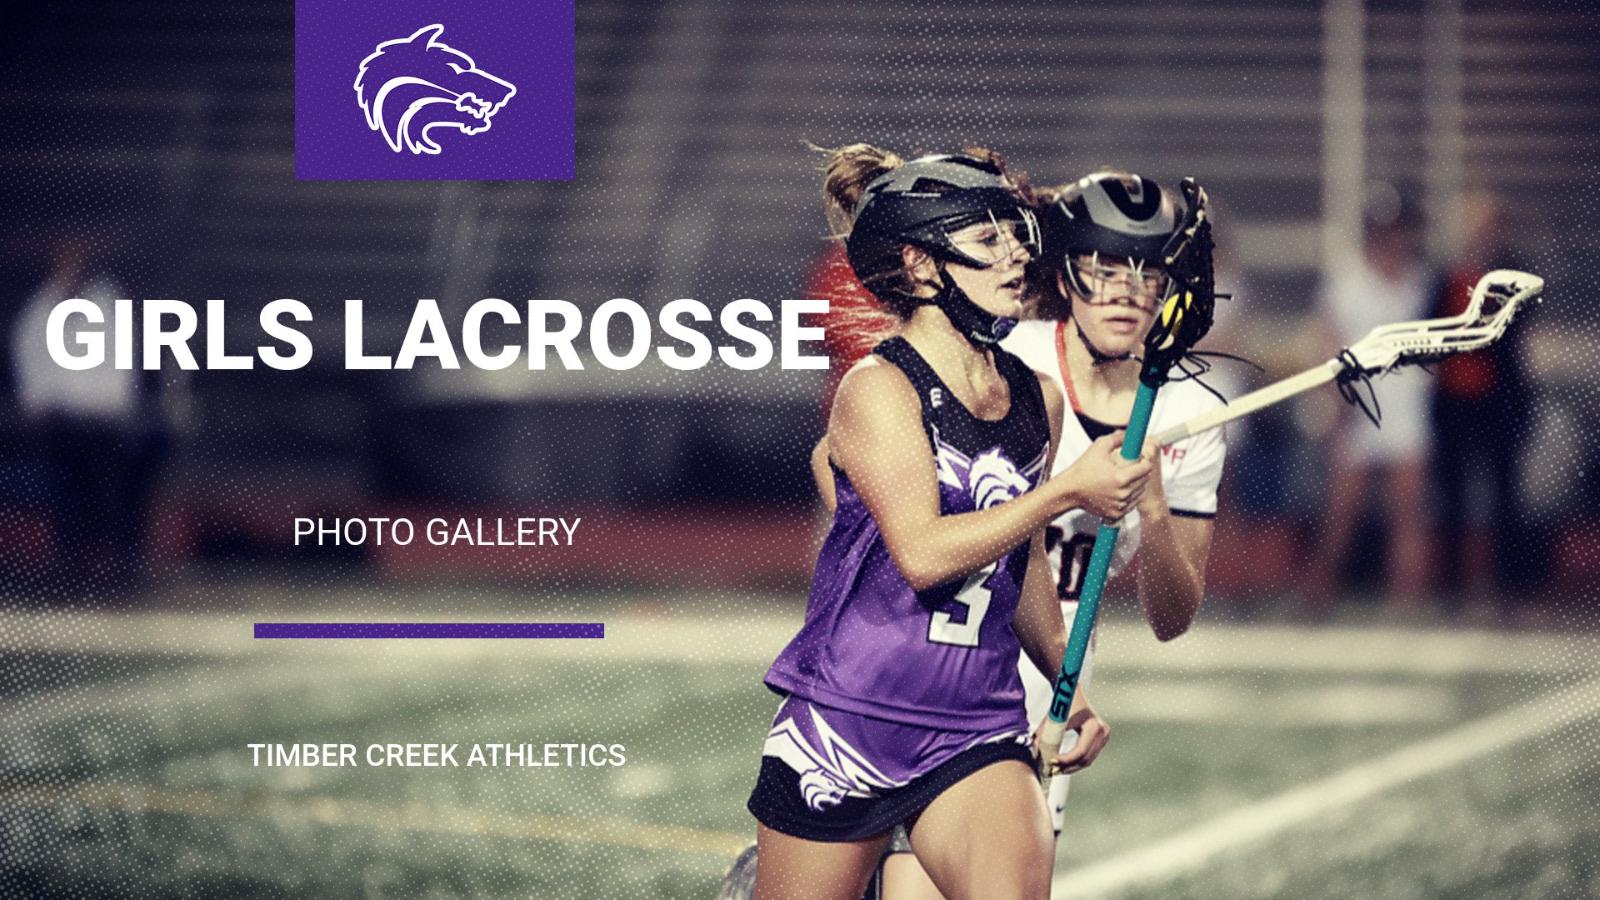 Girls Lacrosse | Photo Gallery